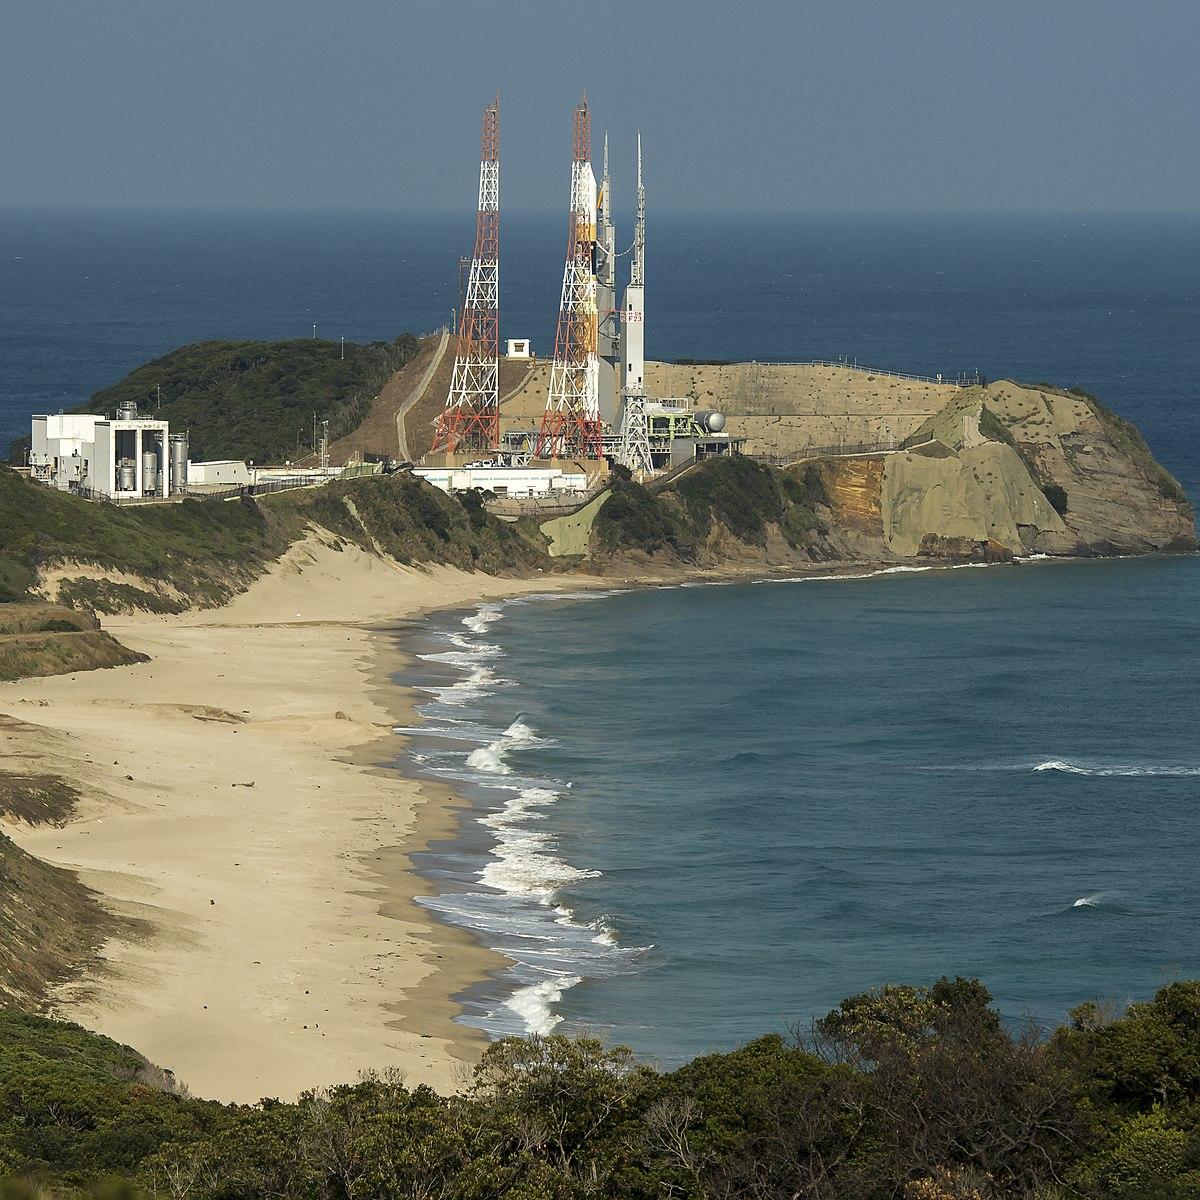 Global Views Wikipedia: Tanegashima Space Center